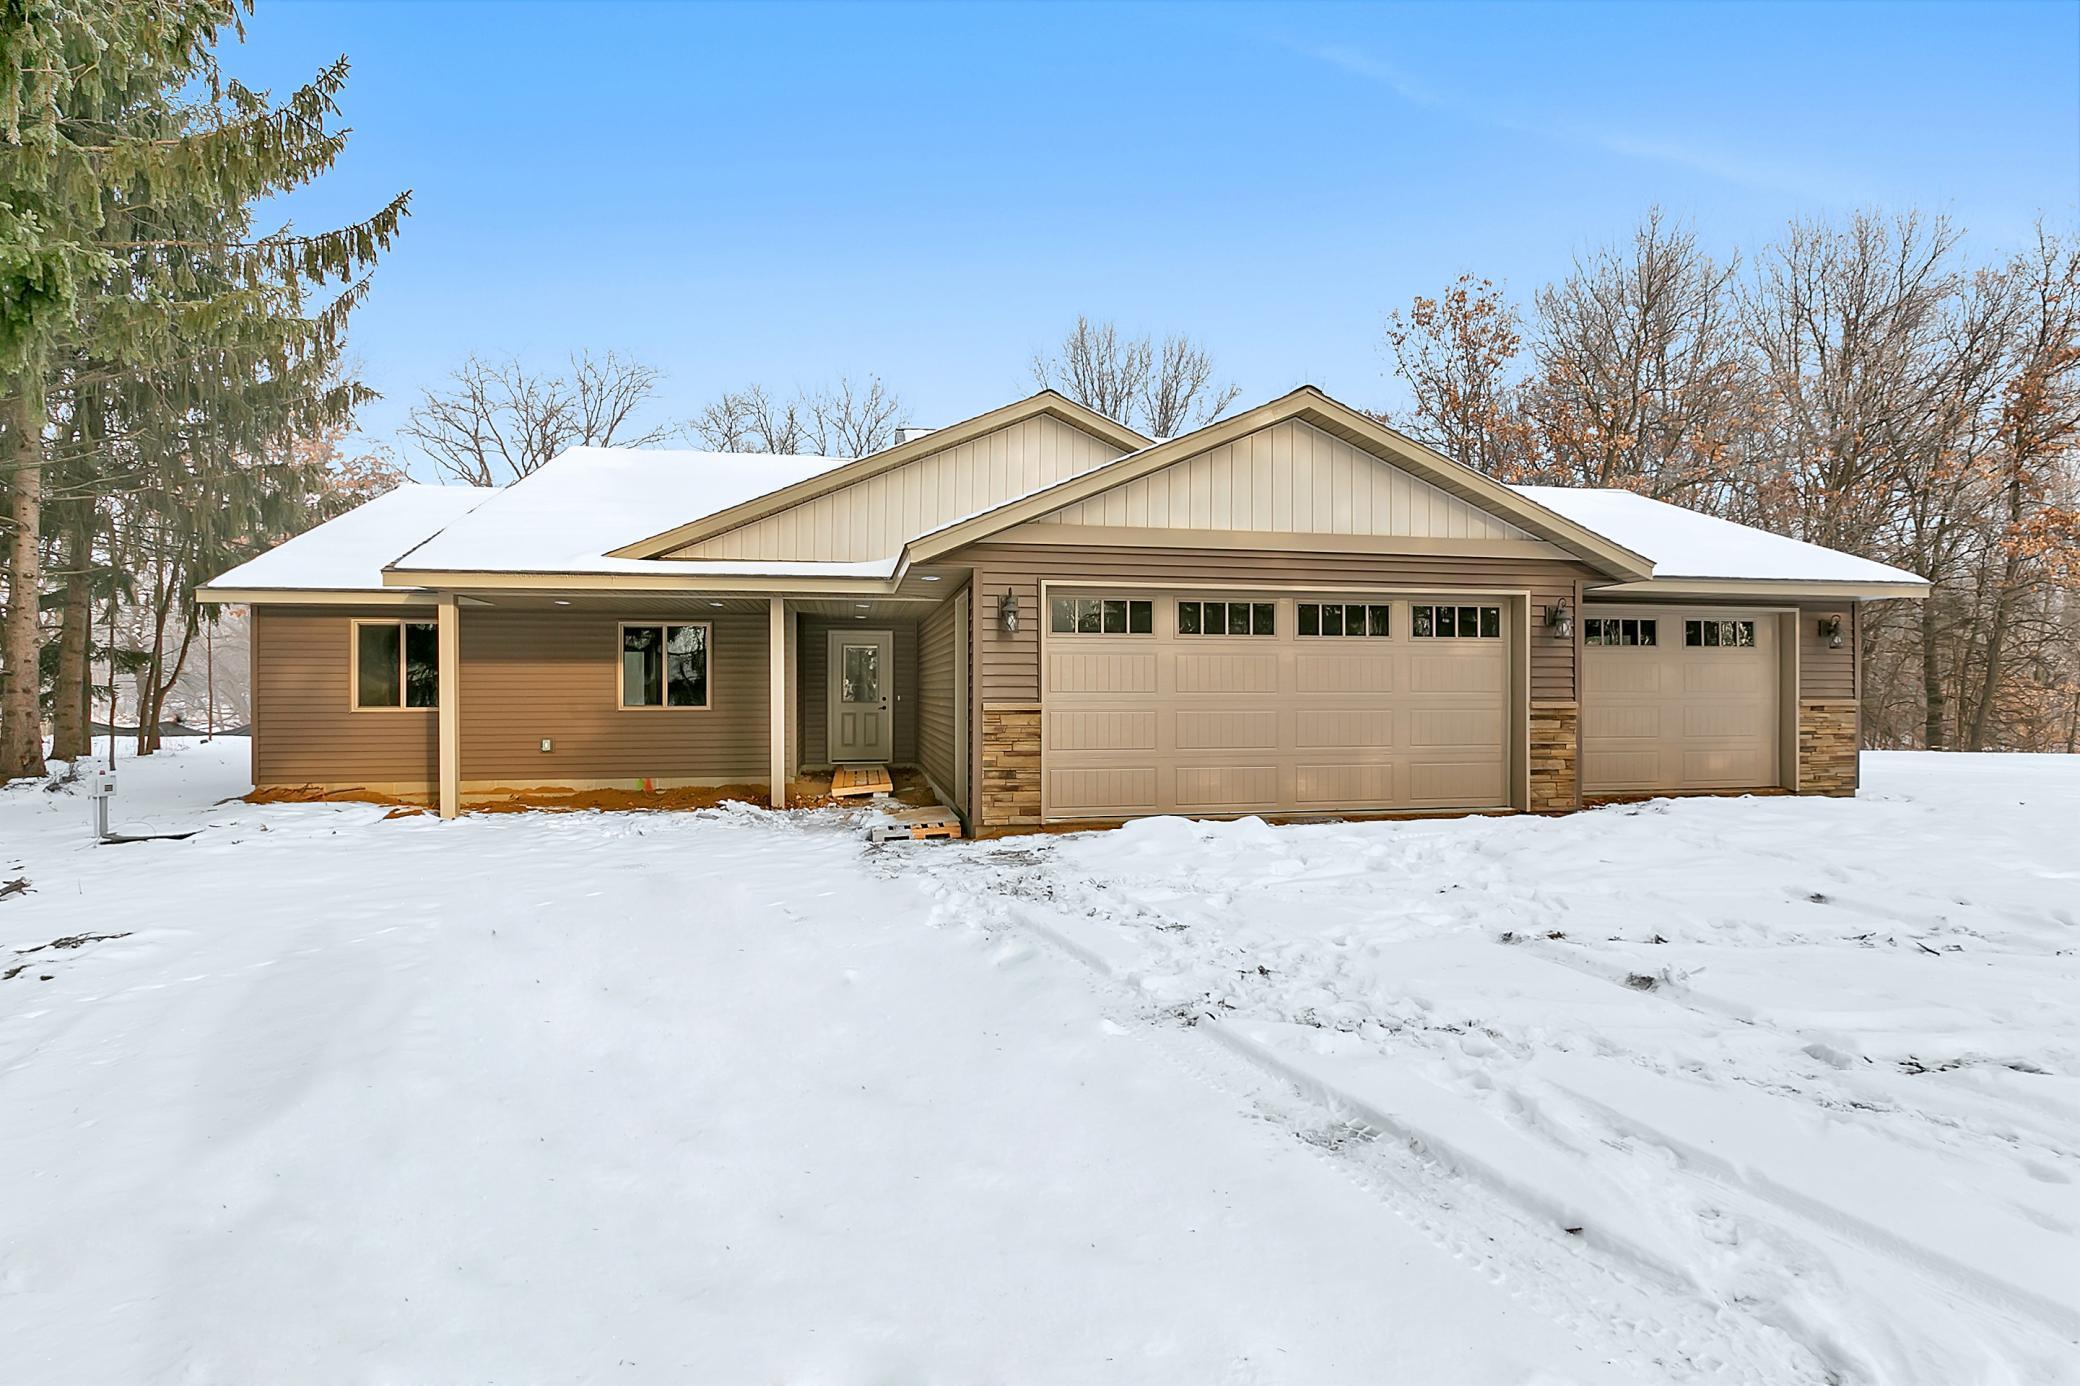 813 N Evergreen Street Property Photo - Royalton, MN real estate listing